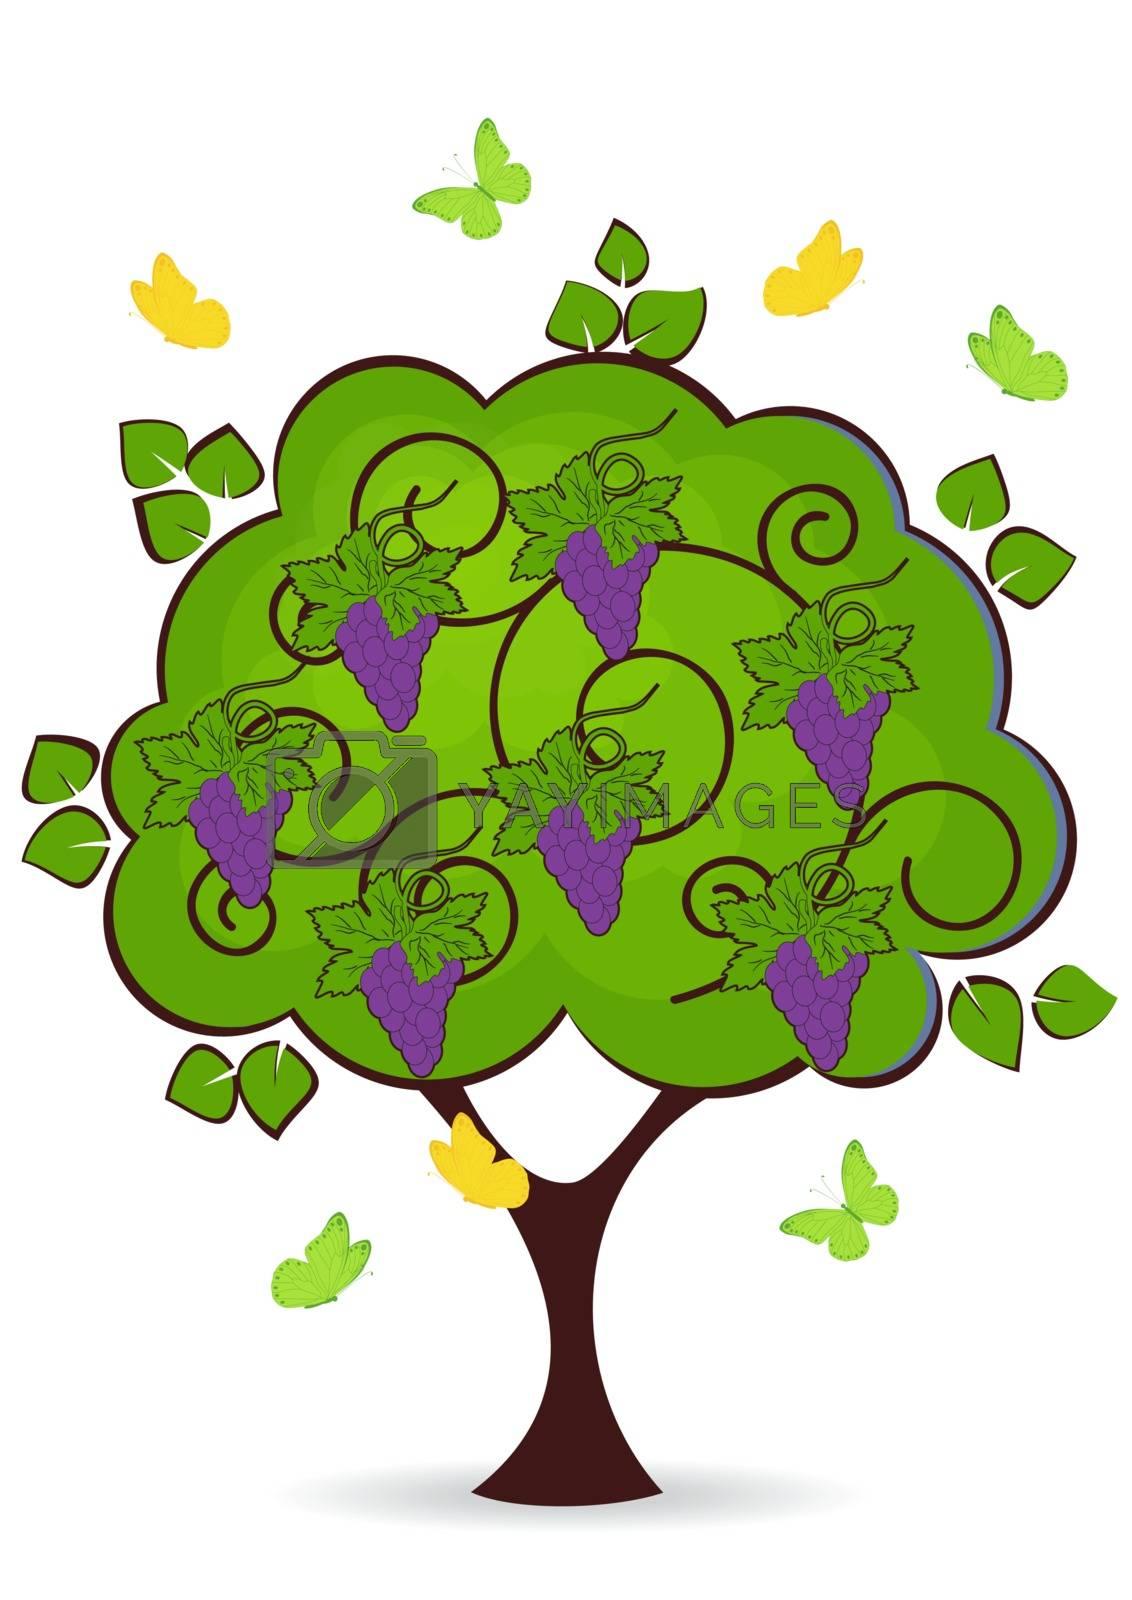 Royalty free image of grape tree by rodakm